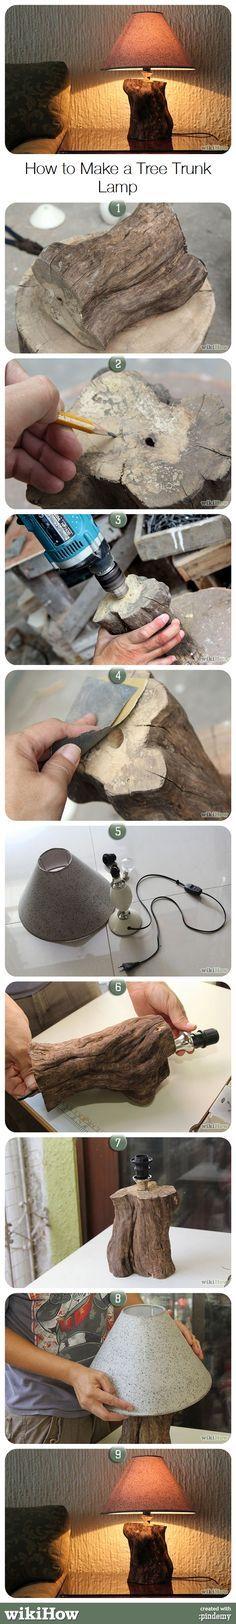 Holzlampe herstellen